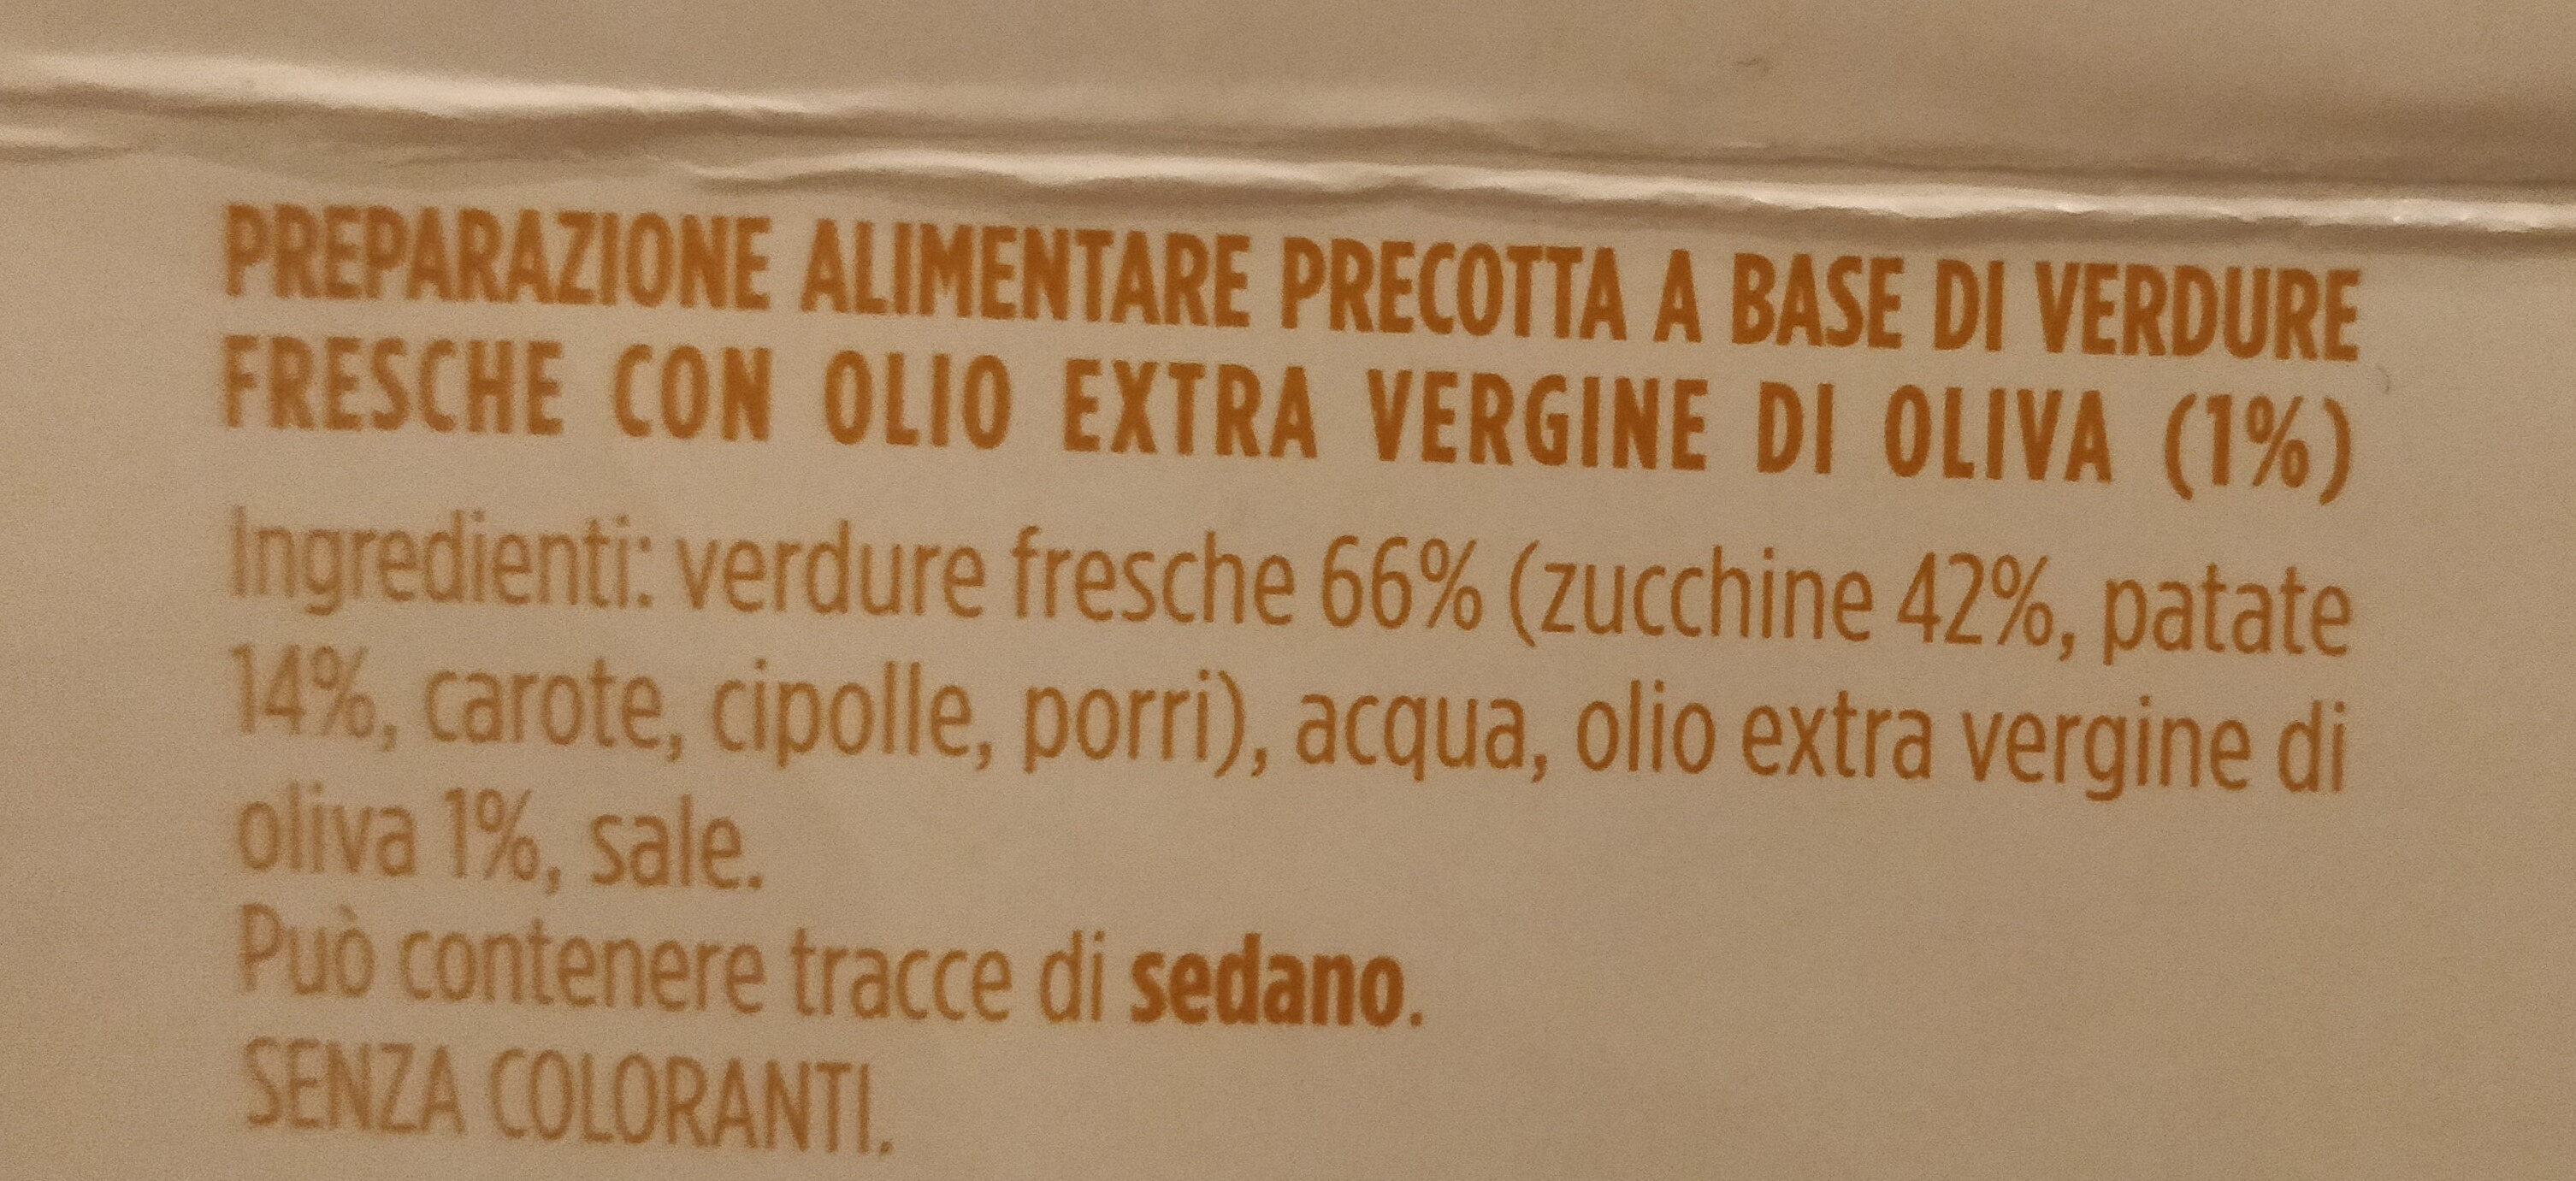 Crema di verdure con zucchine e patate - Ingrédients - it